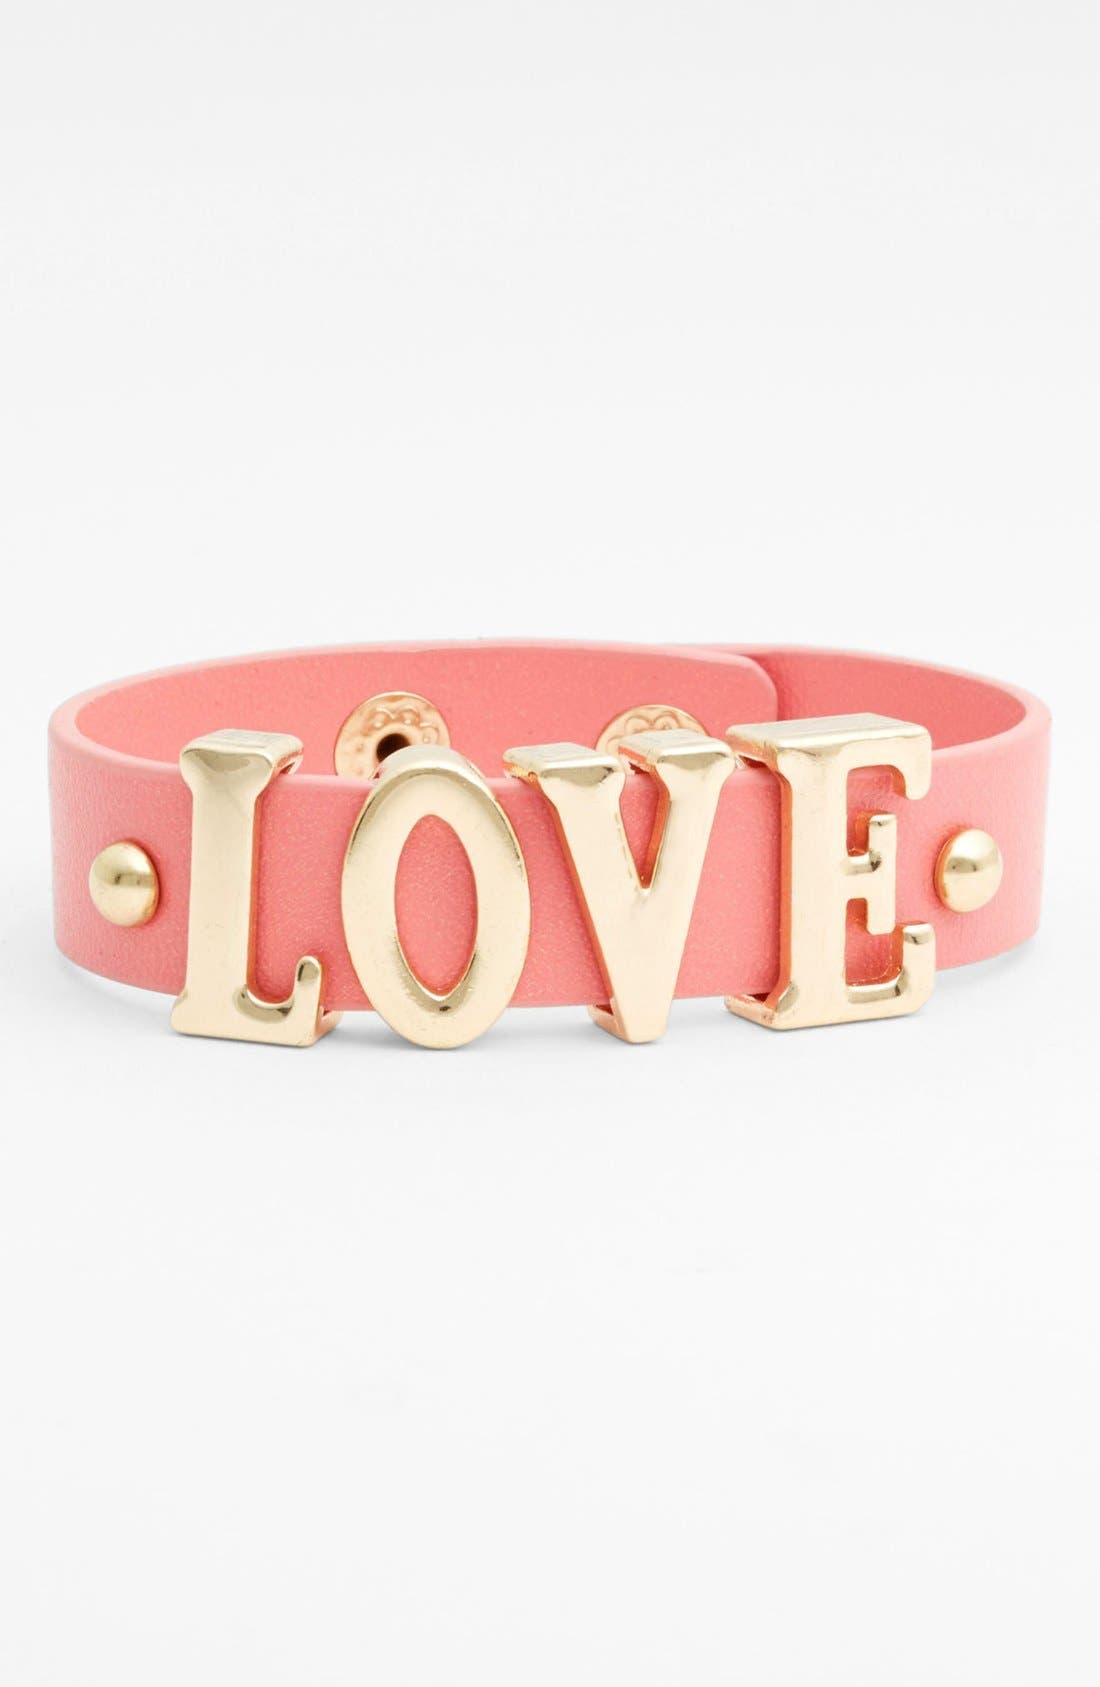 Alternate Image 1 Selected - Carole 'Love' Wrap Bracelet (Juniors) (Online Only)